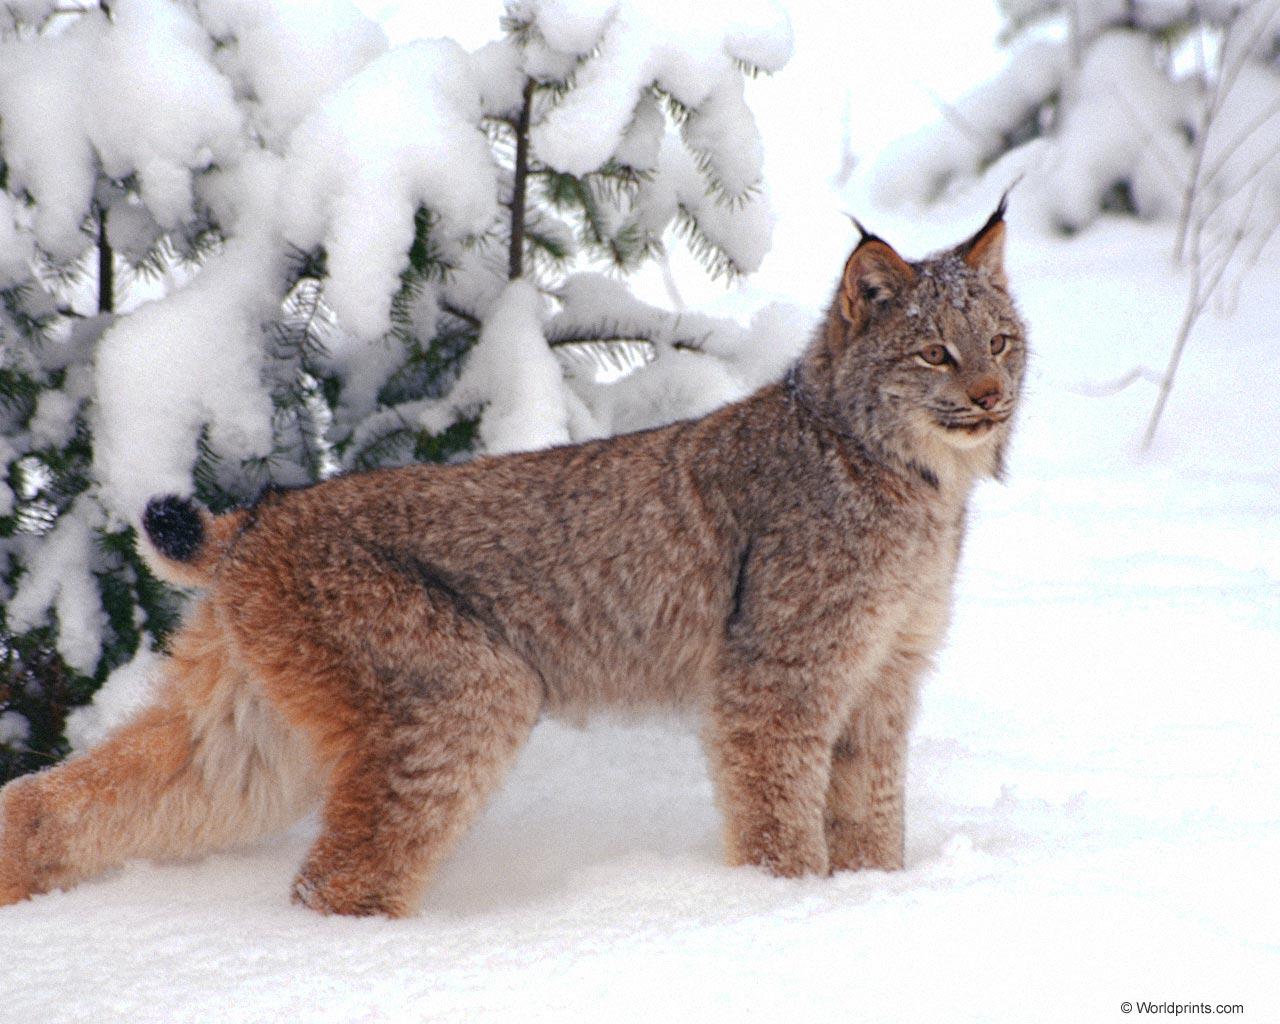 Linh Mieu - Lynx - A stately Creature